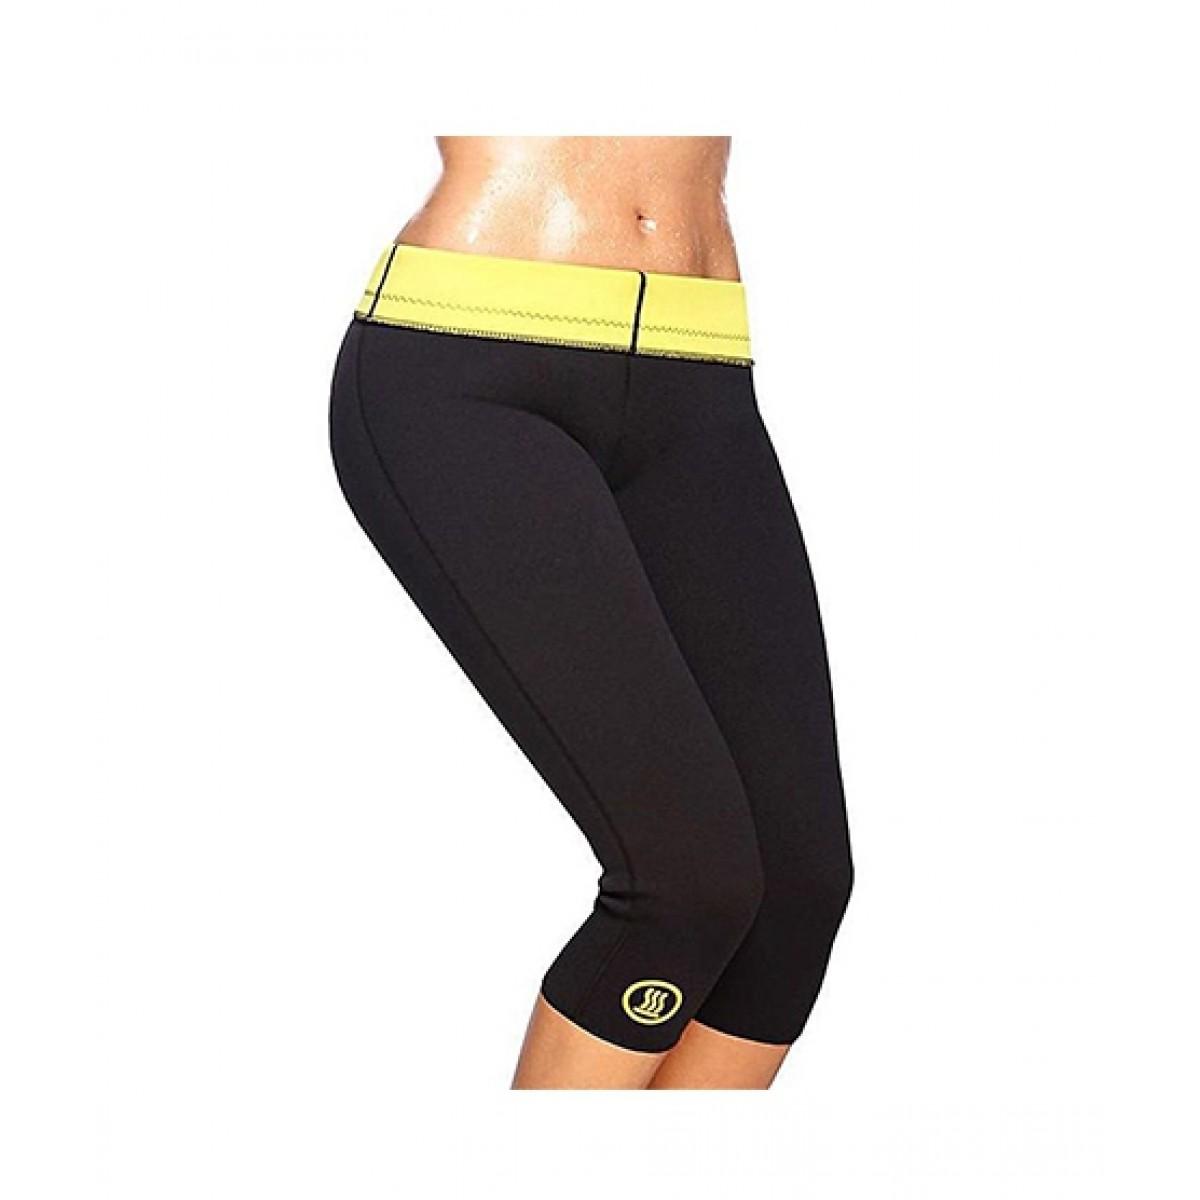 0b4d6e353c Rubian Hot Shaper Pant For Women Price in Pakistan